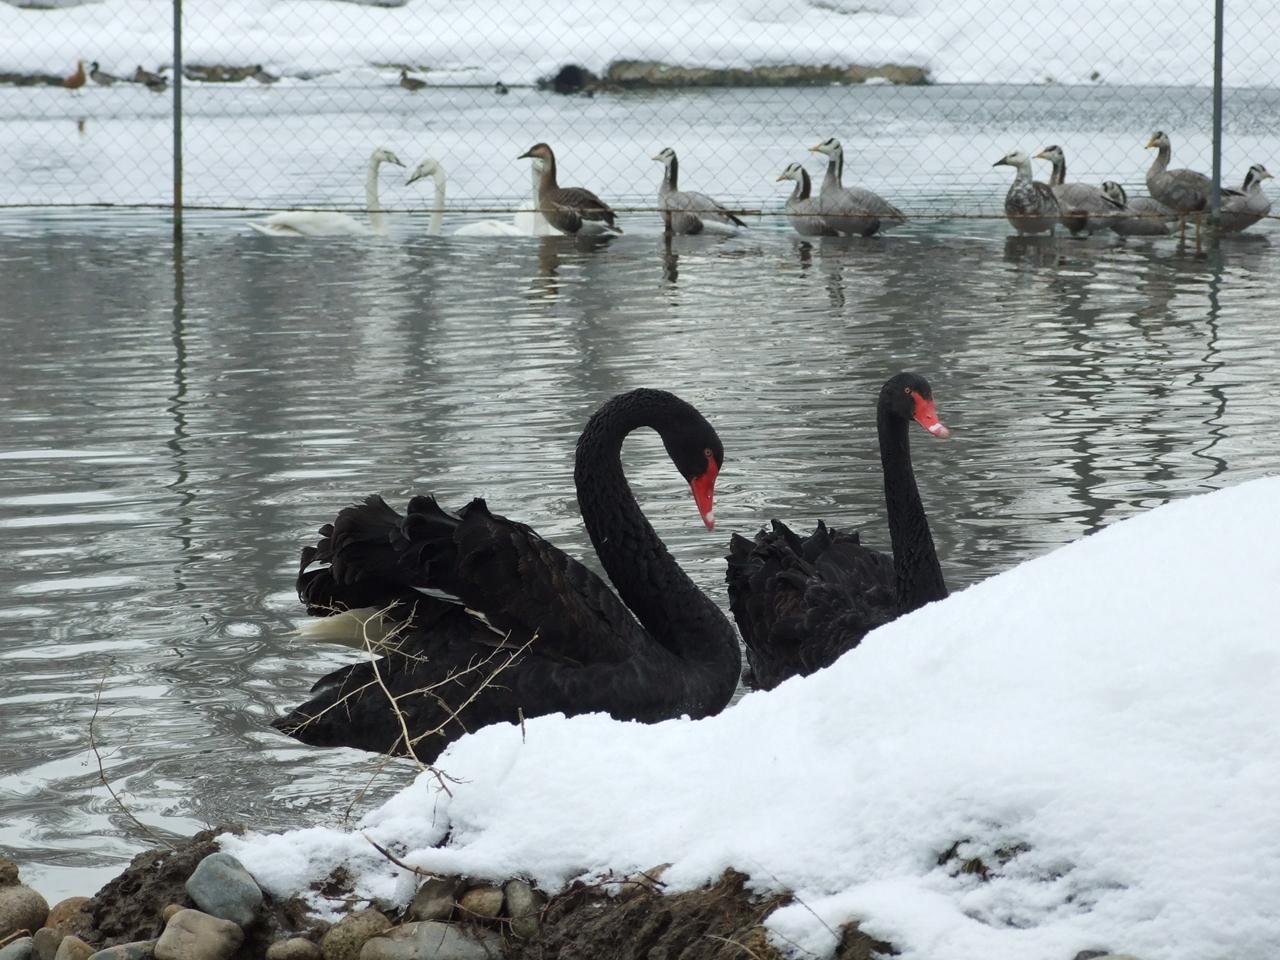 Black swans 17